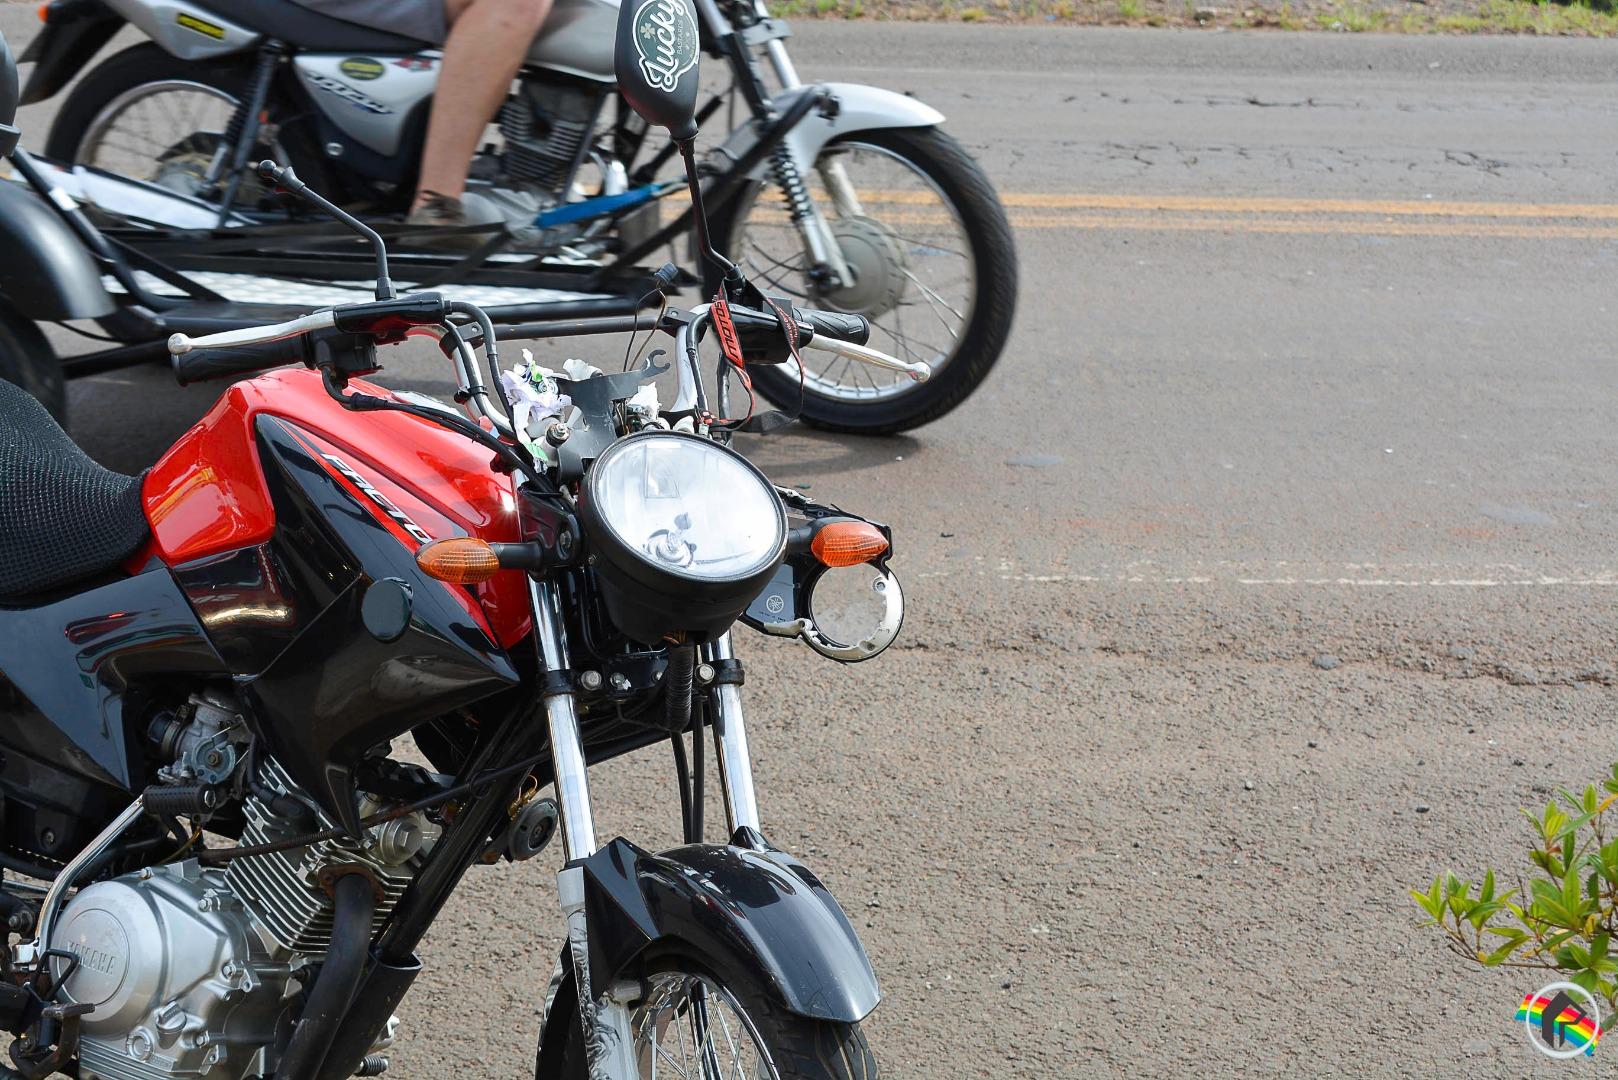 Motociclista colide na traseira de viatura do Exército